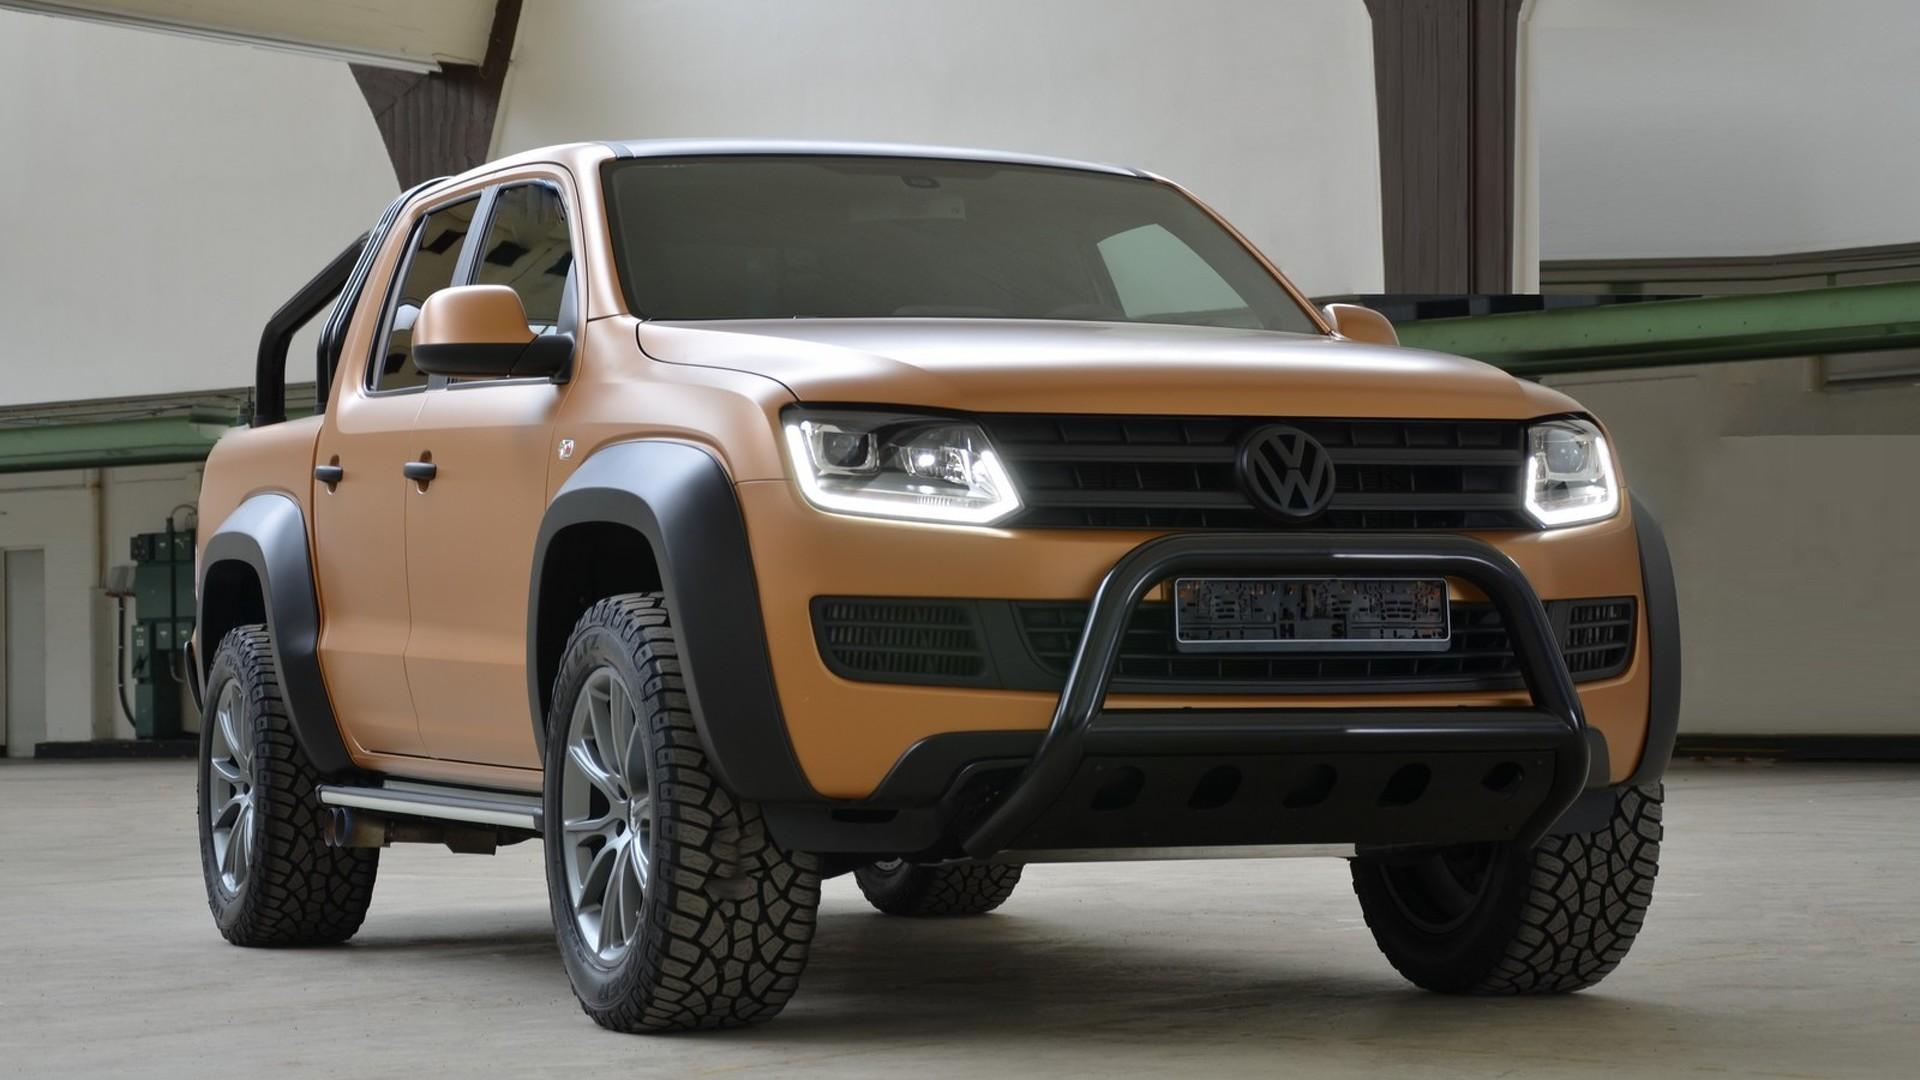 Vw Amarok V8 Passion Desert Edition Unveiled Costs 217k